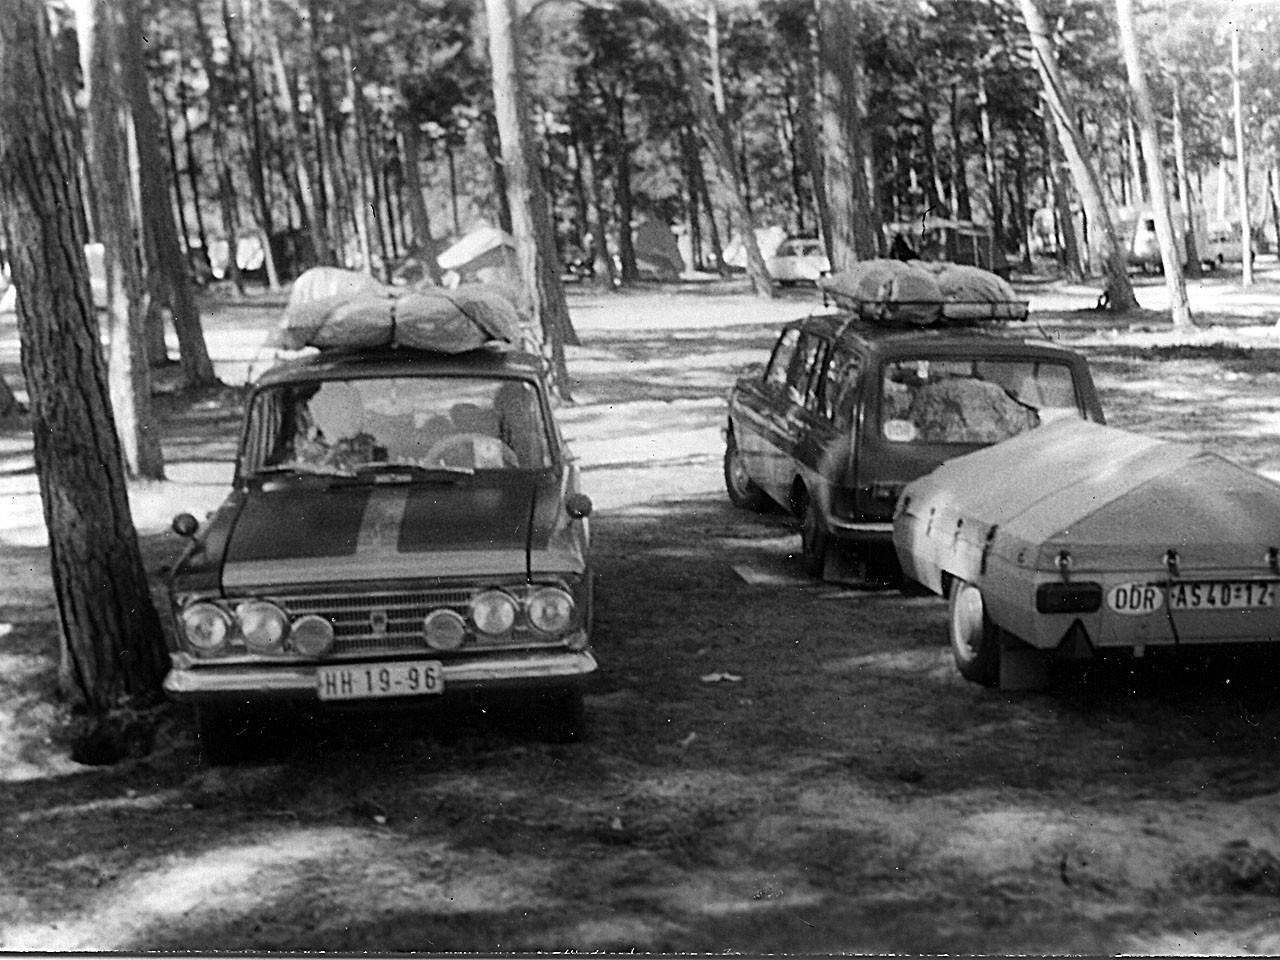 Fahrt nach Masuren 1976